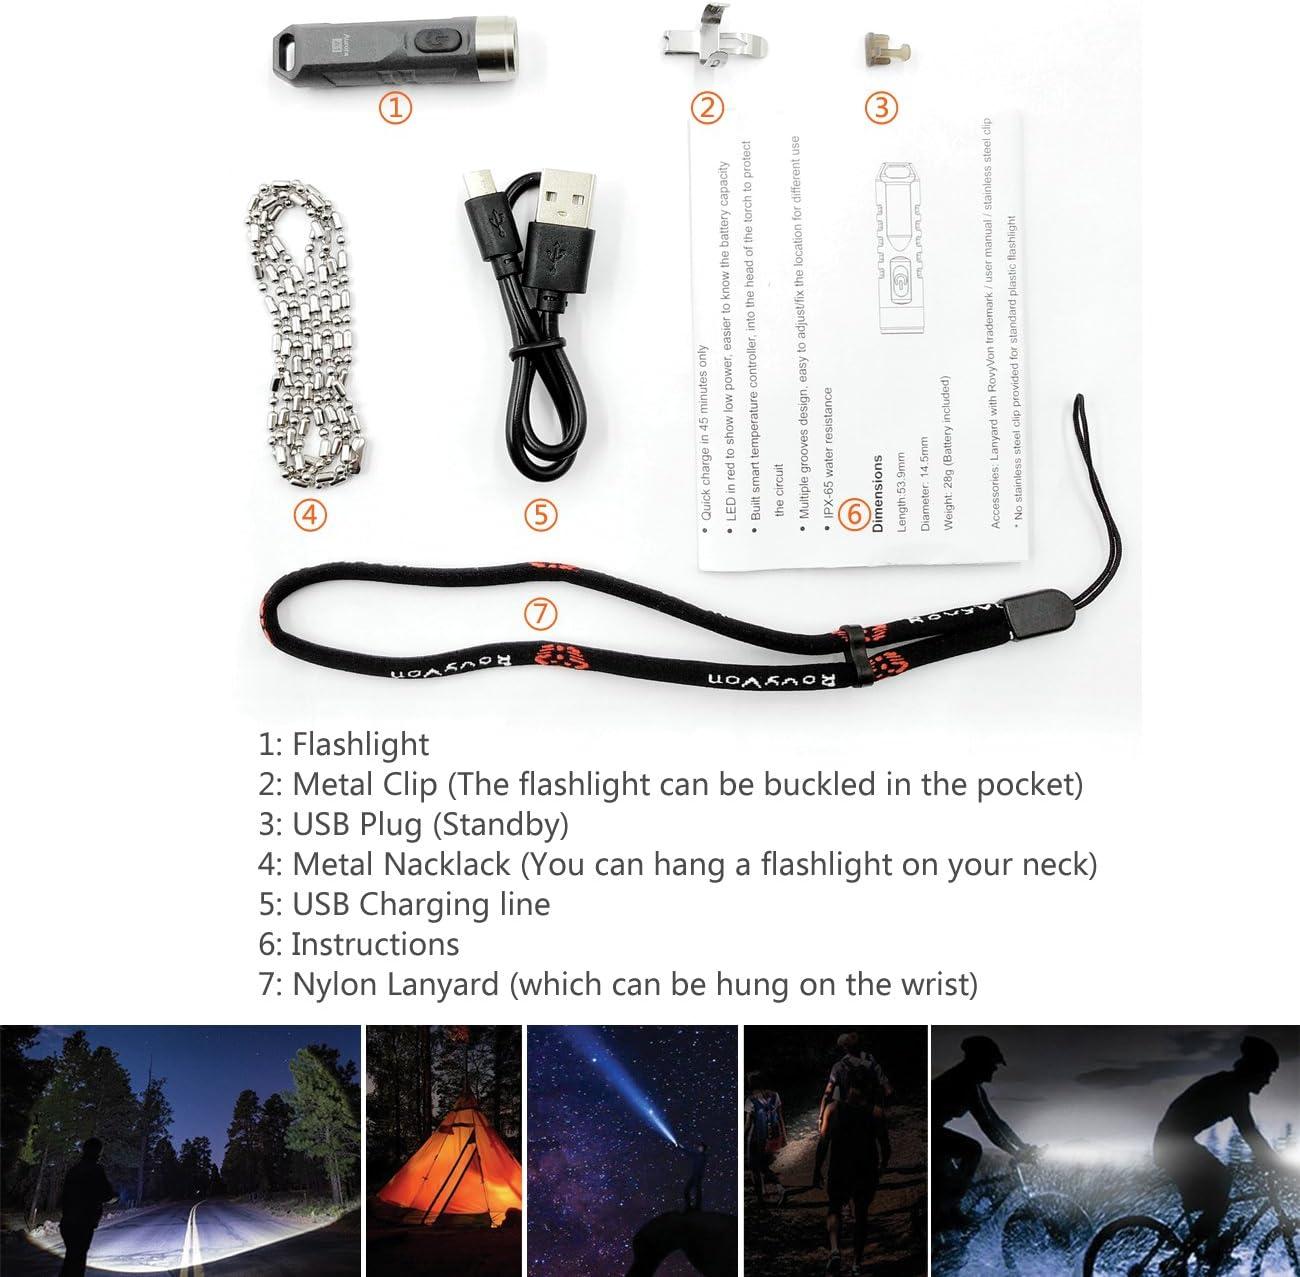 Led Flashlight Rechargeable 550 Lumens Mini Flashlight Led Waterproof Small Flashlight for Camping 4 Modes Black